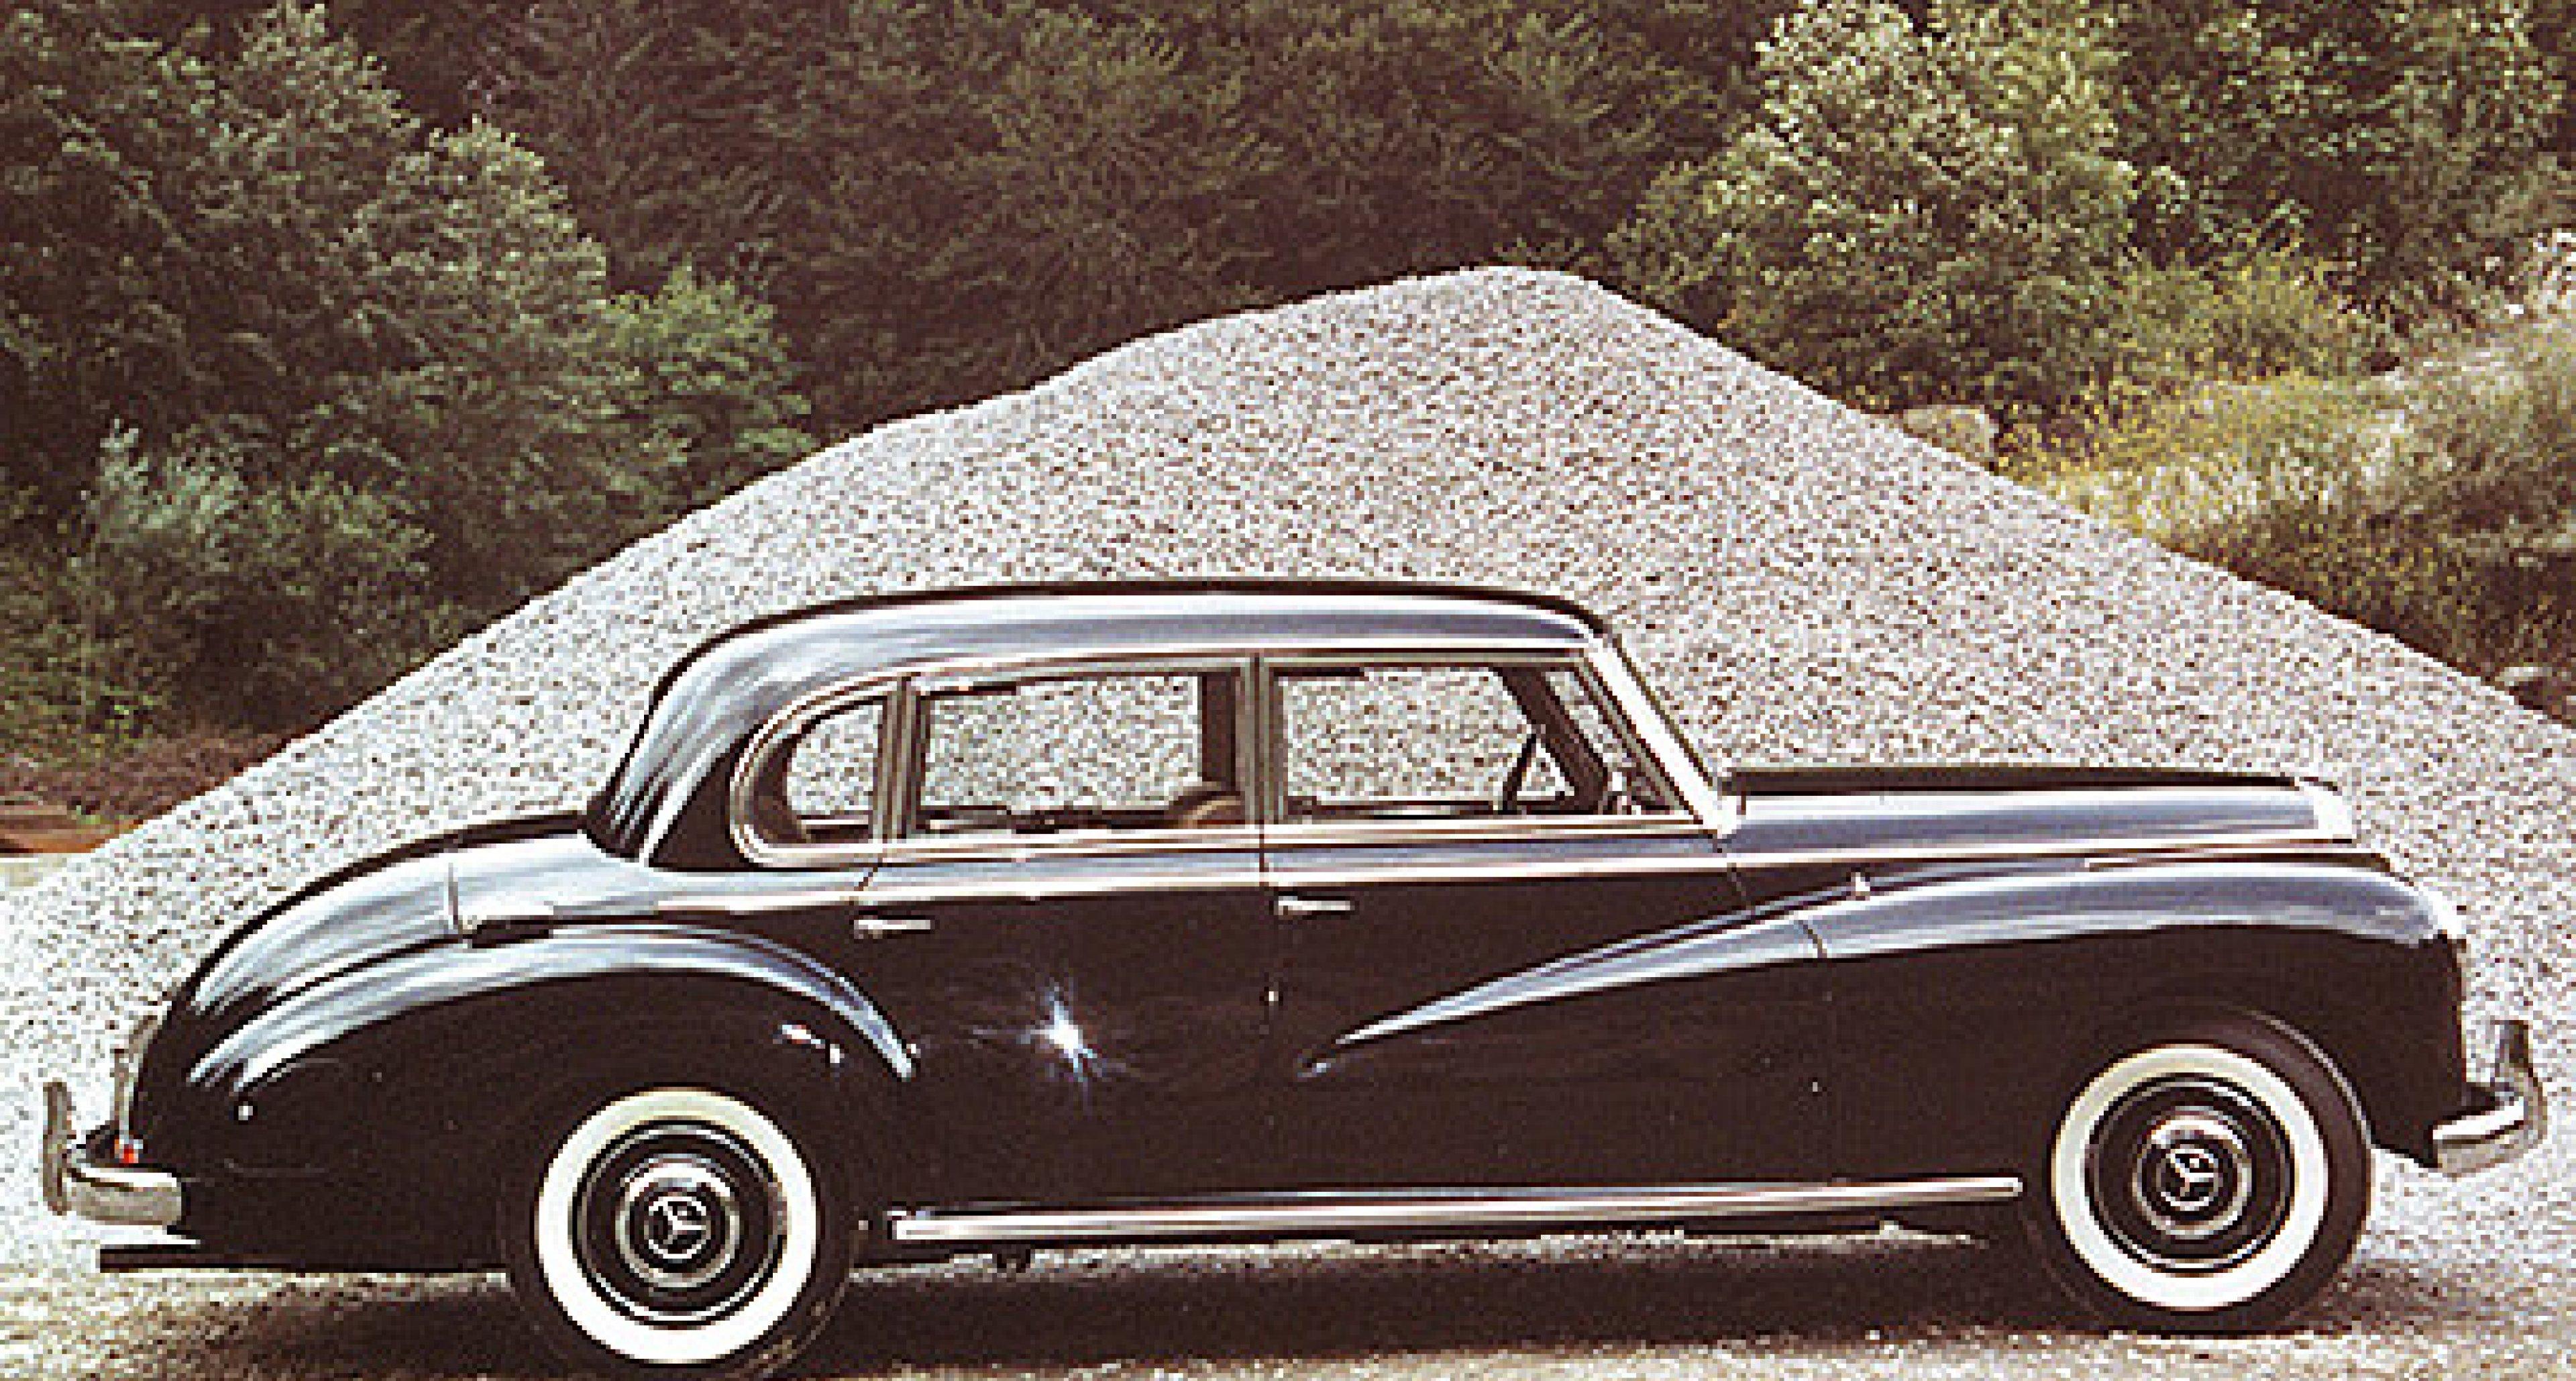 100 Klassische Automobile Auktion 2005 - Vorschau